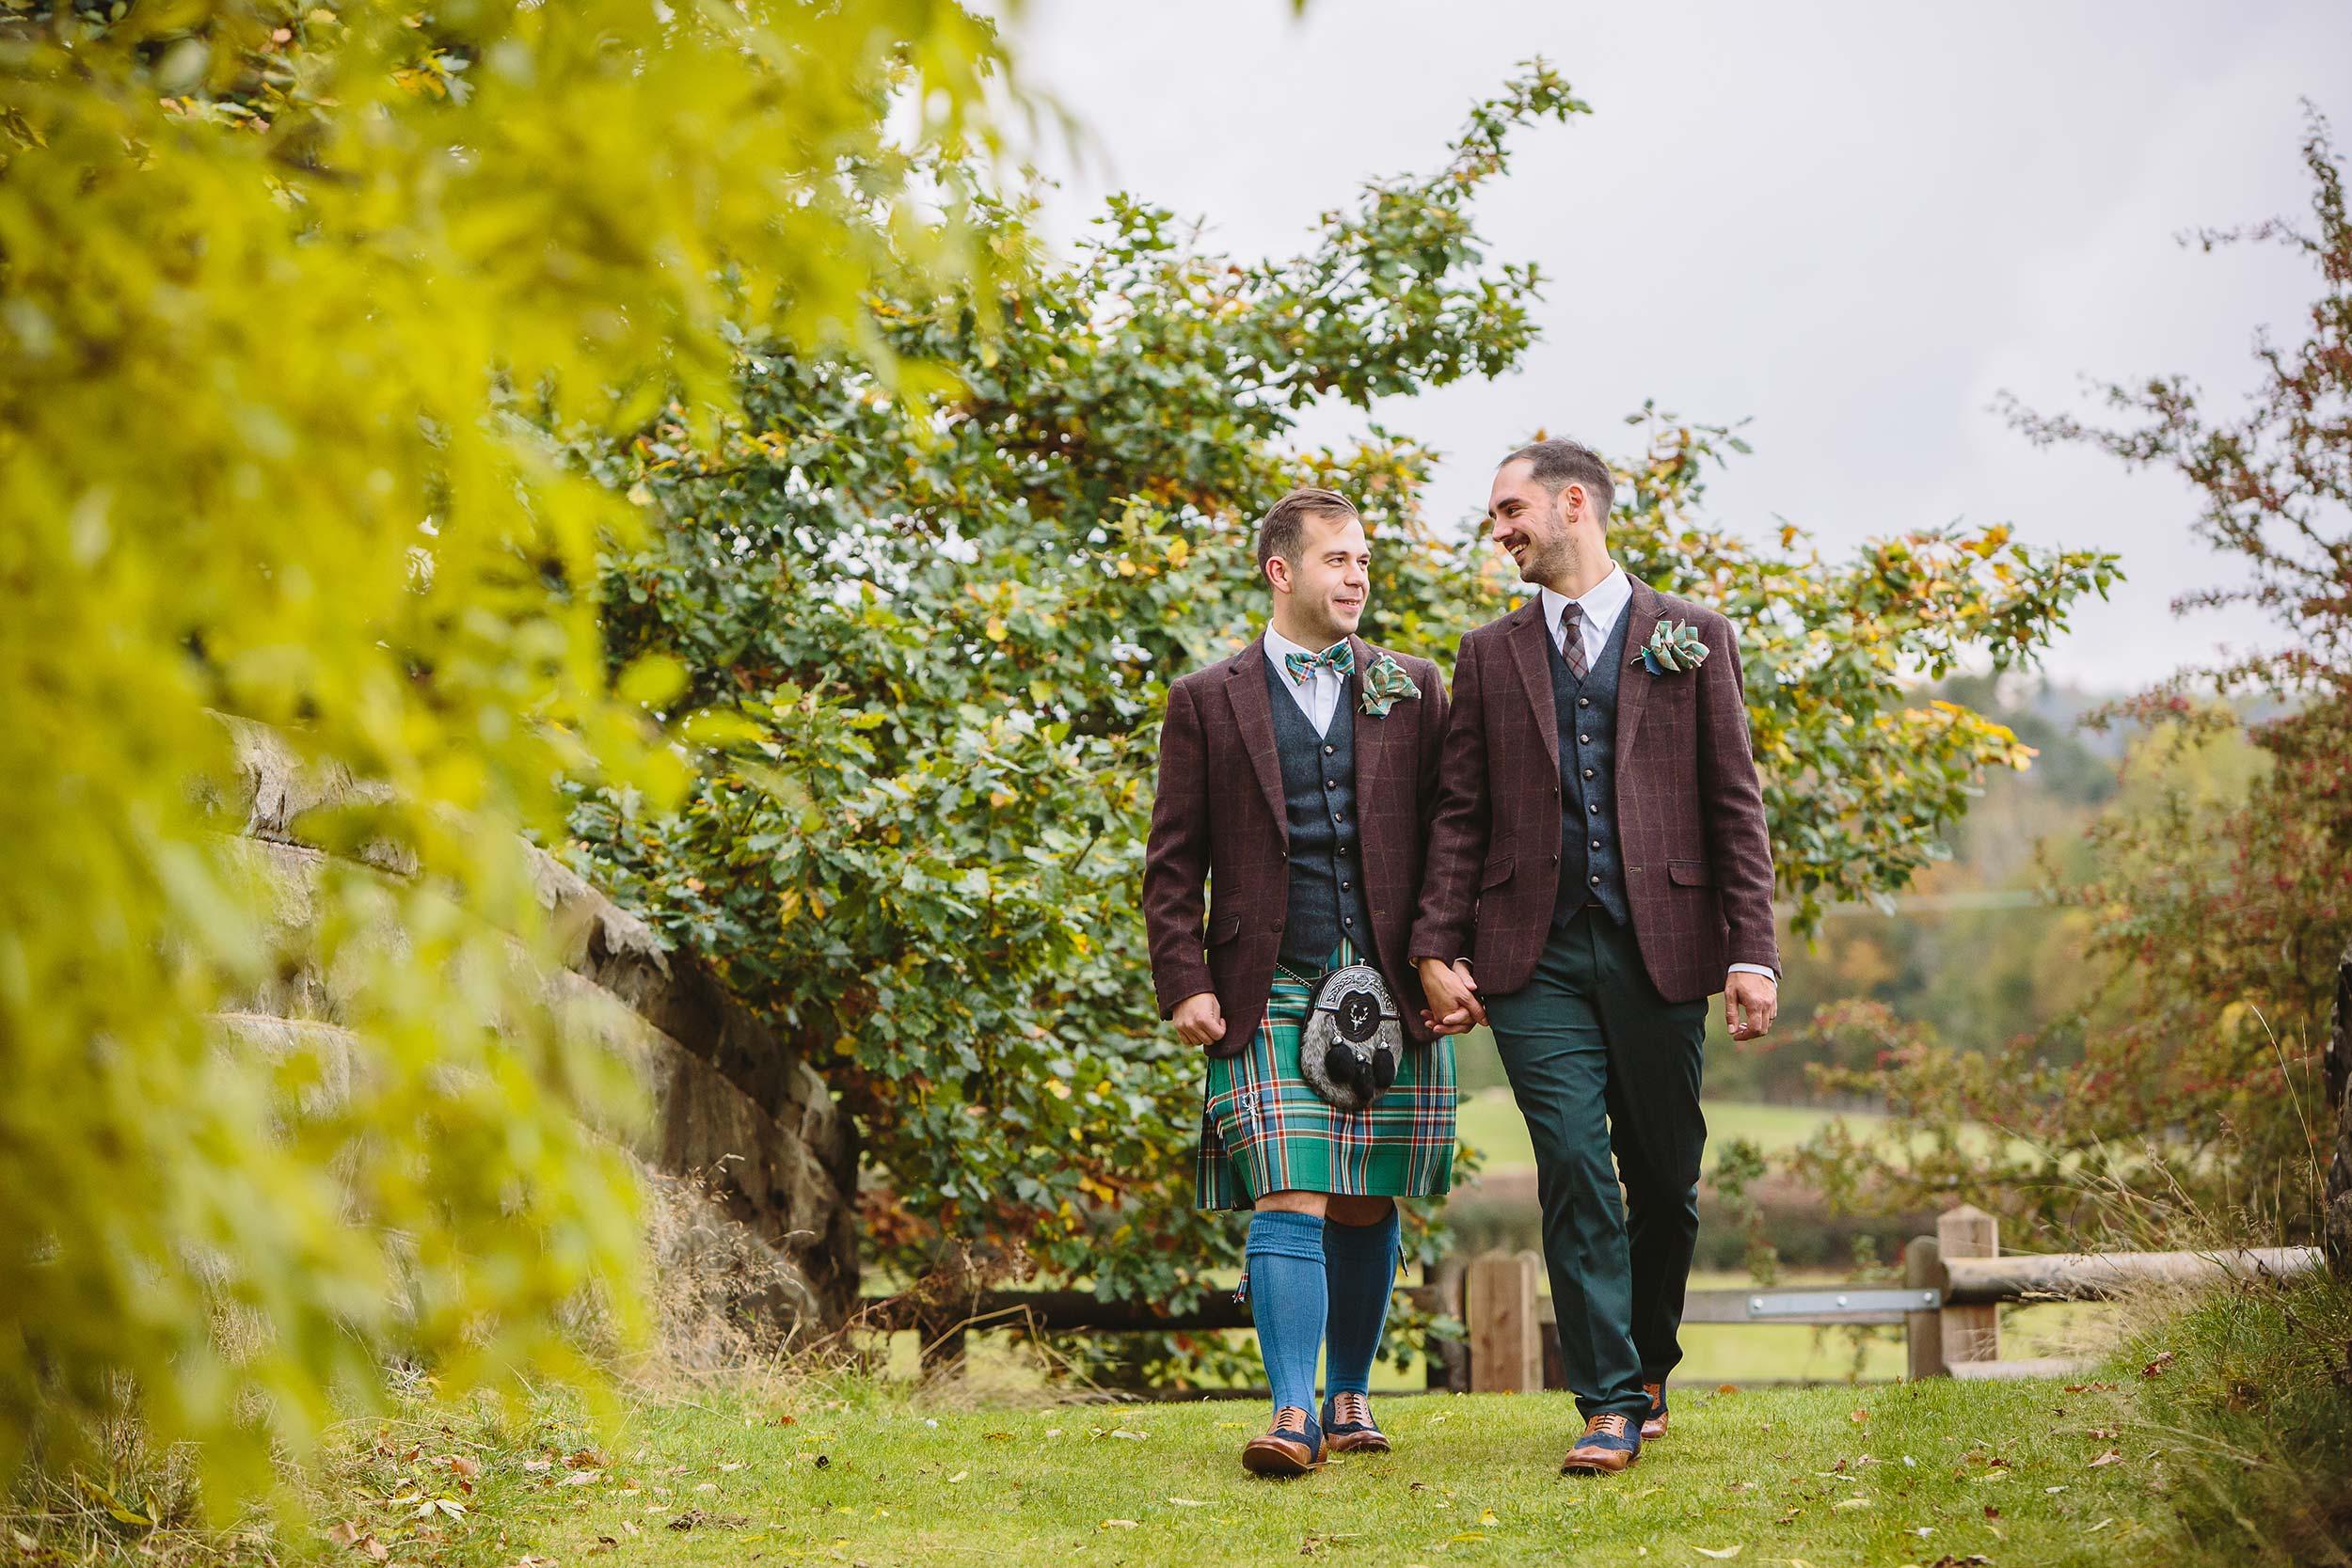 Tim-Tom-Tower-Hill-Barns-Gay-Wedding-Venue-Barnaby-Aldrick